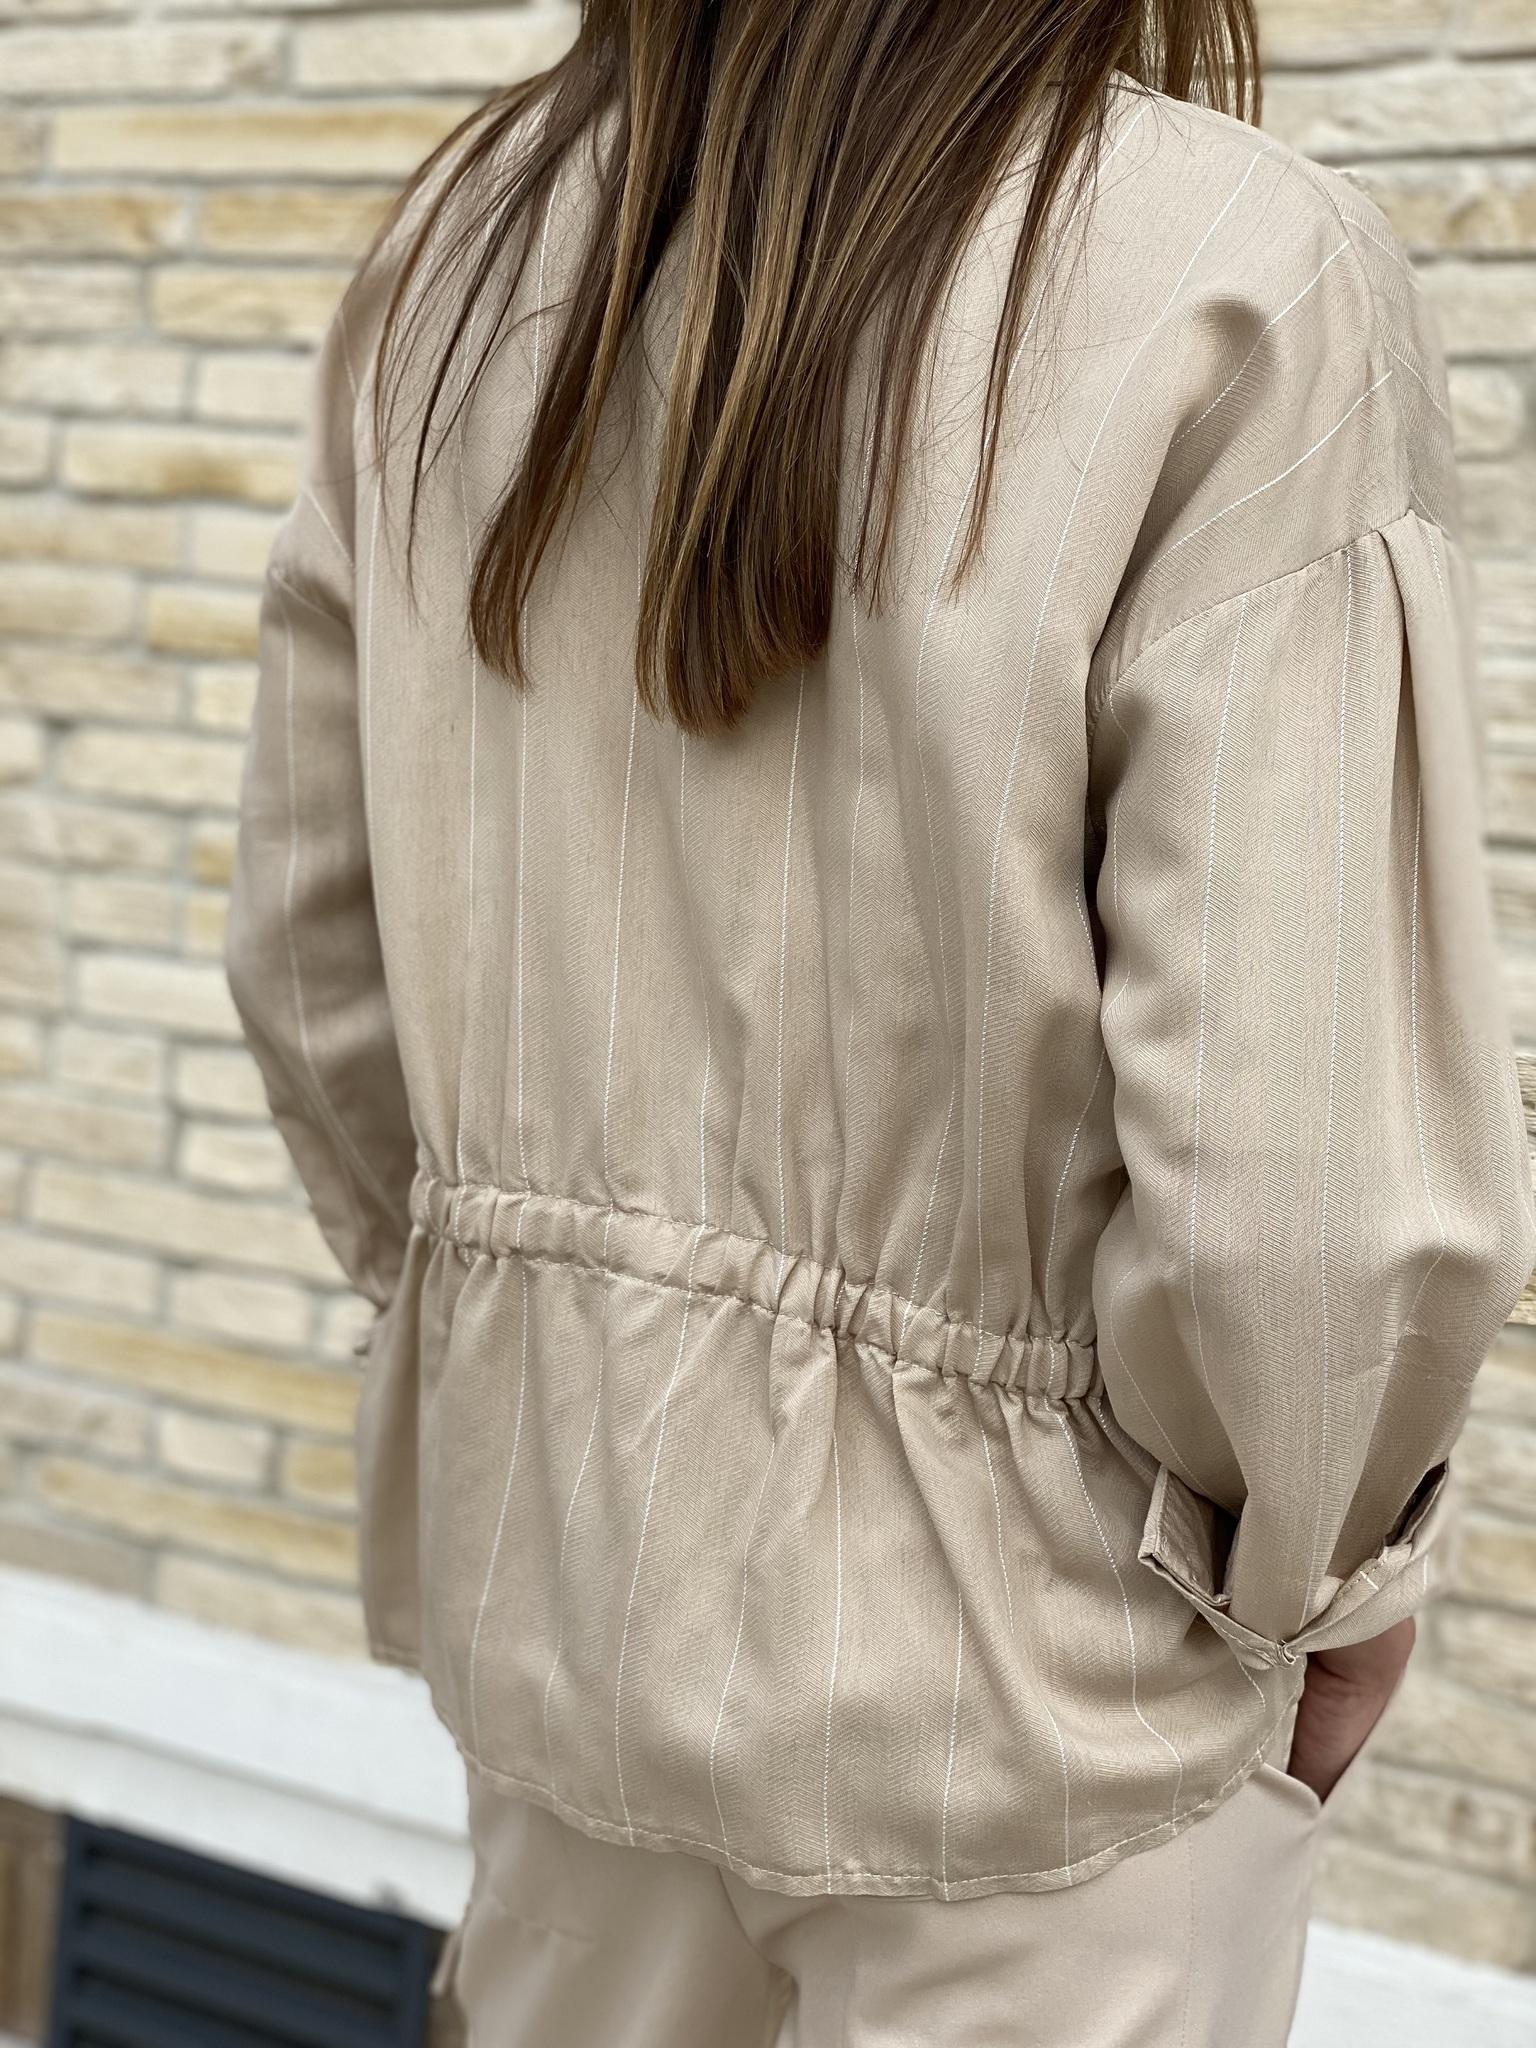 Рубашка, WIYA, C10451 (бежевый)